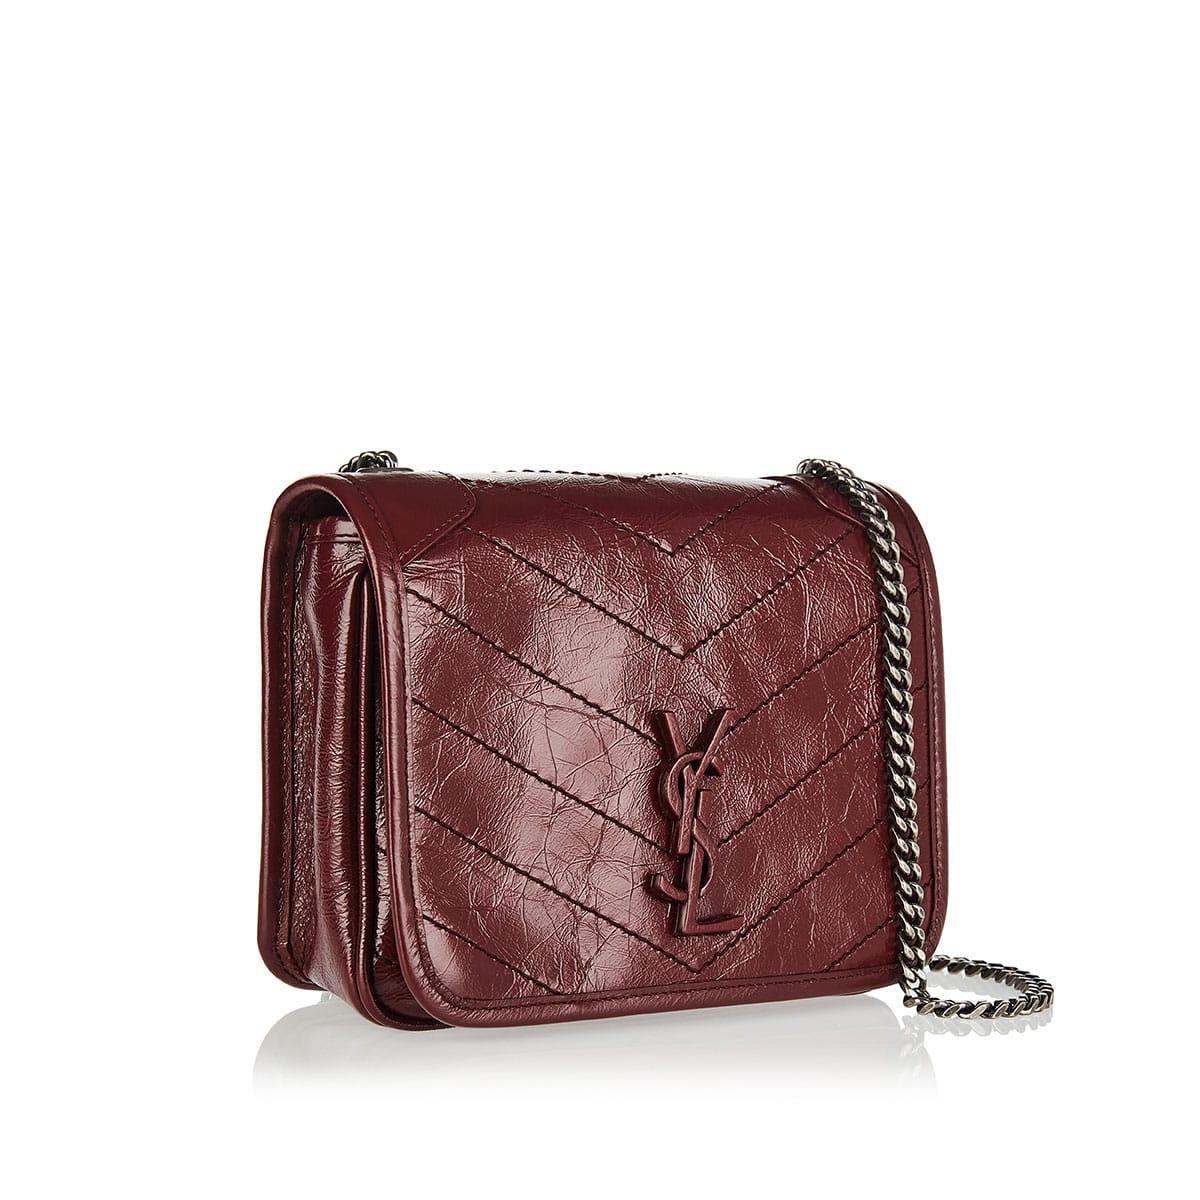 Niki Mini leather shoulder bag